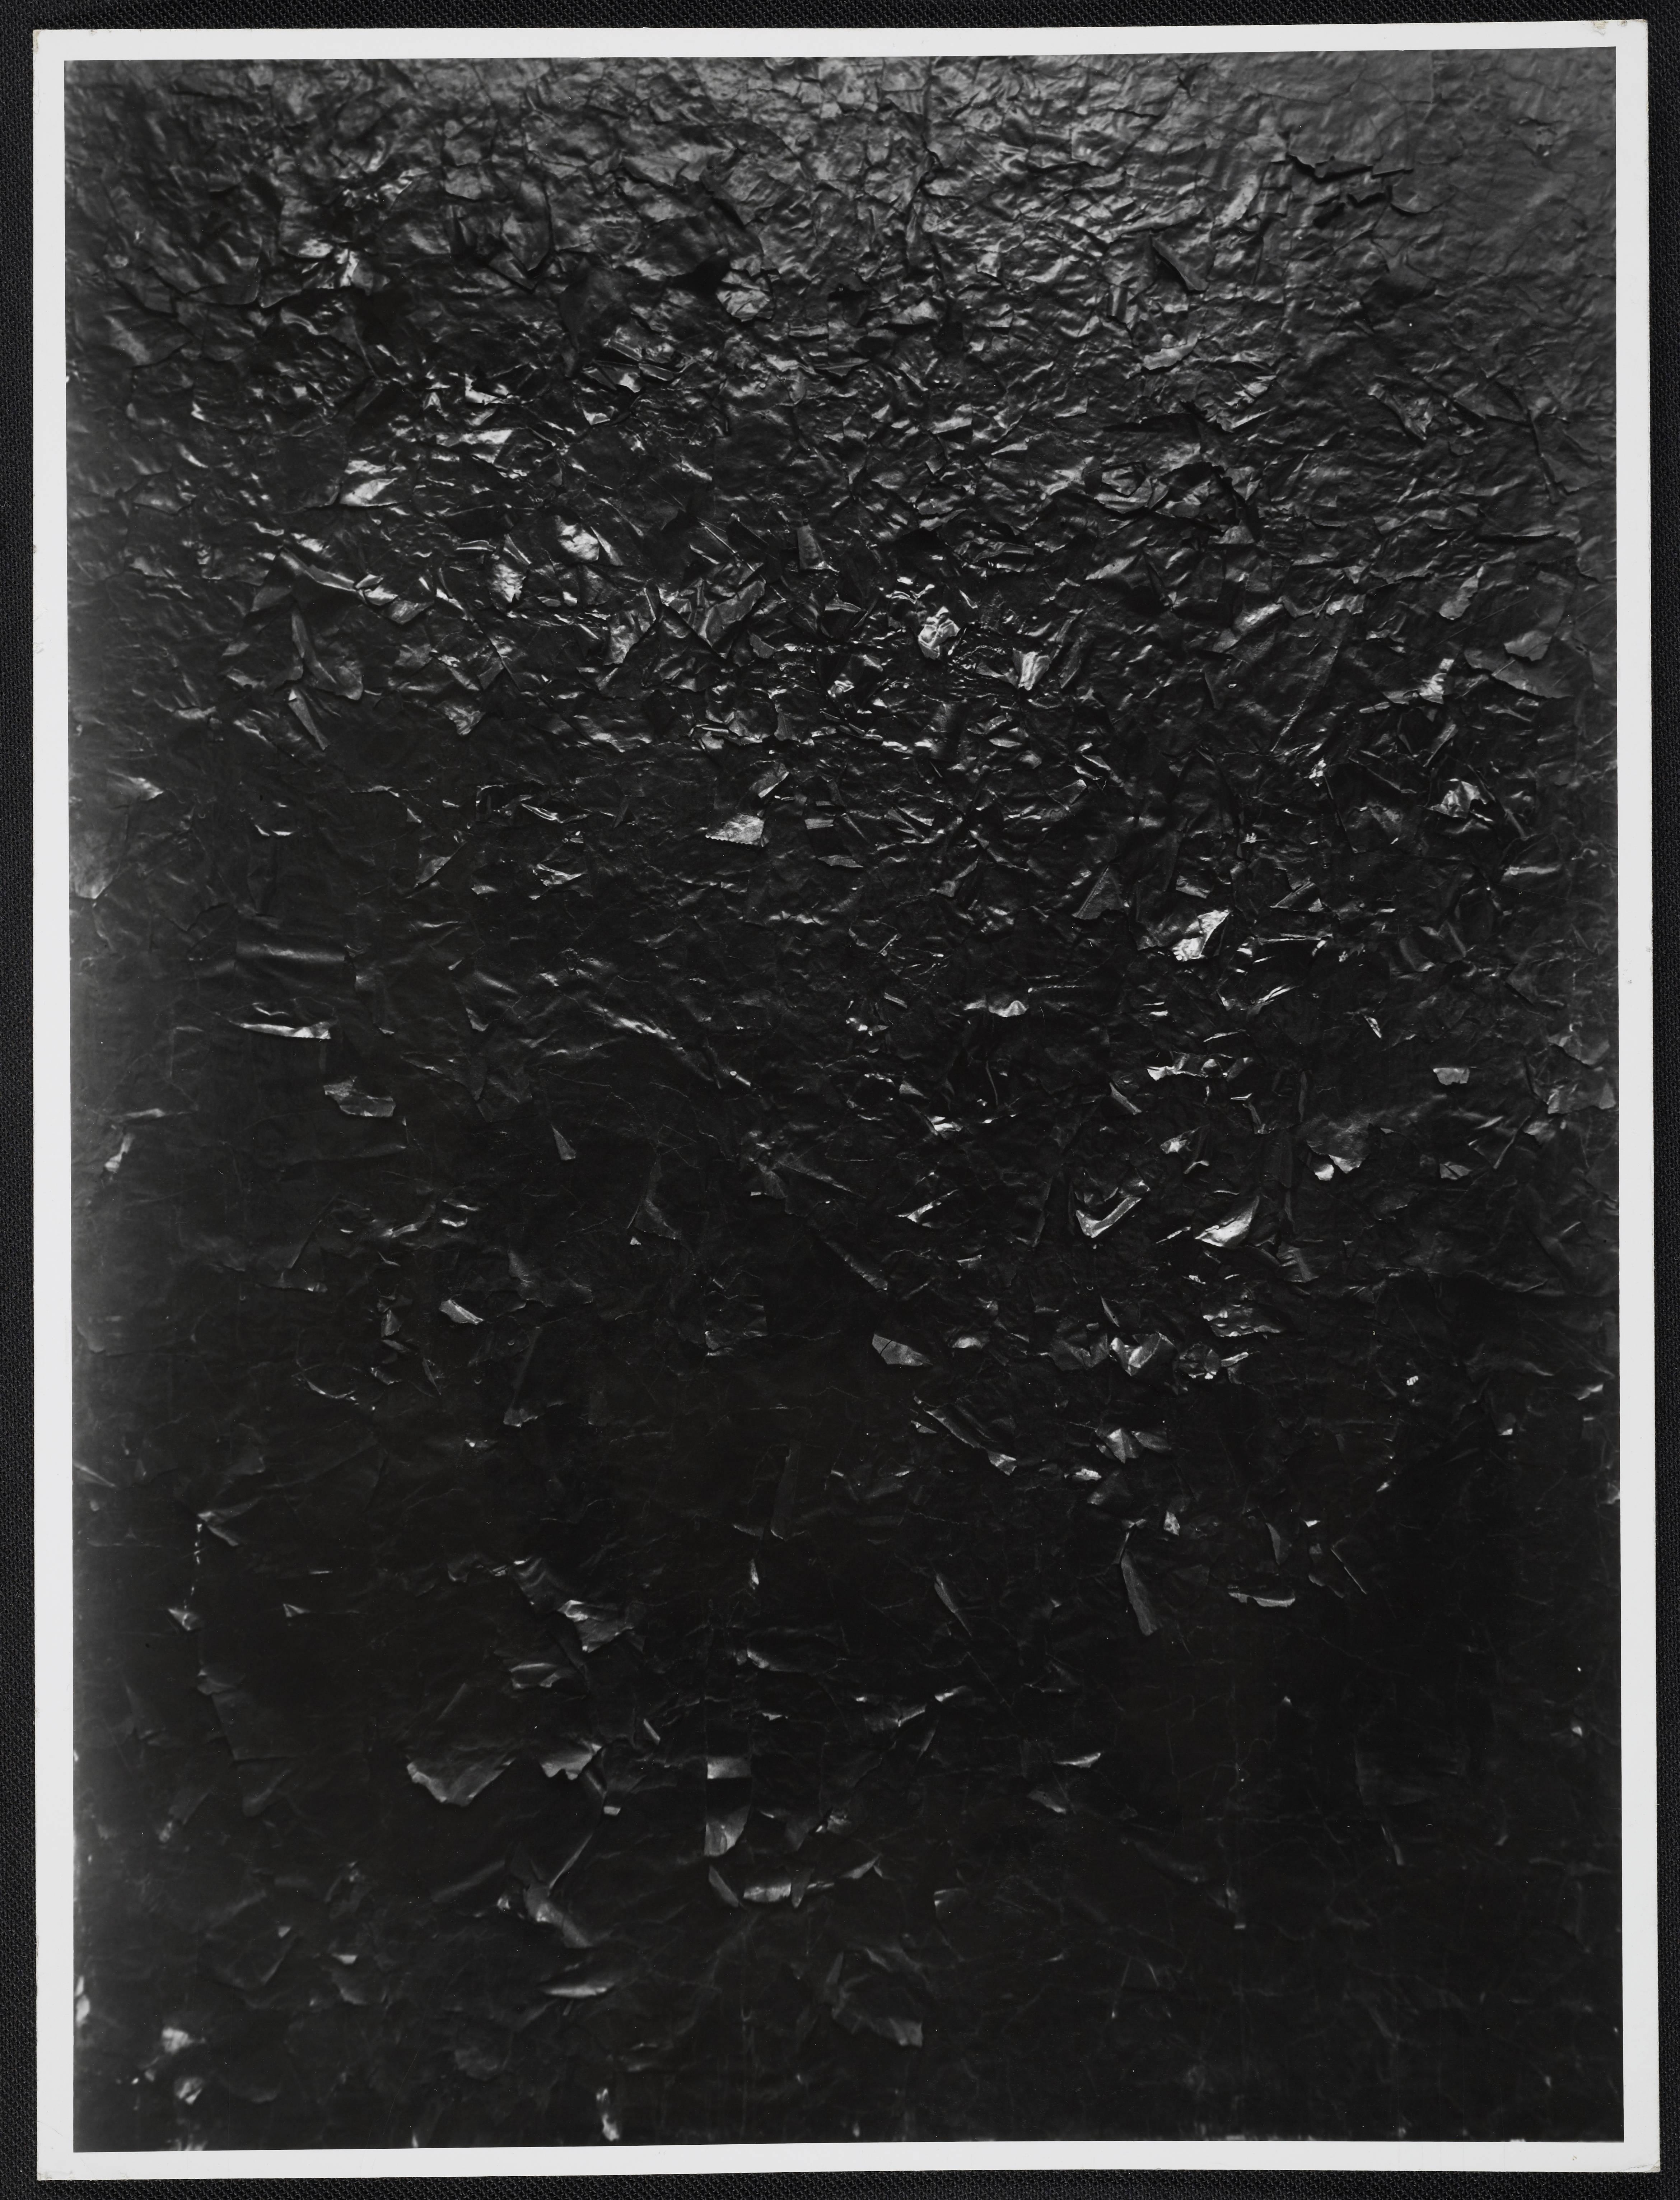 View Of Robert Rauschenberg S Untitled Glossy B